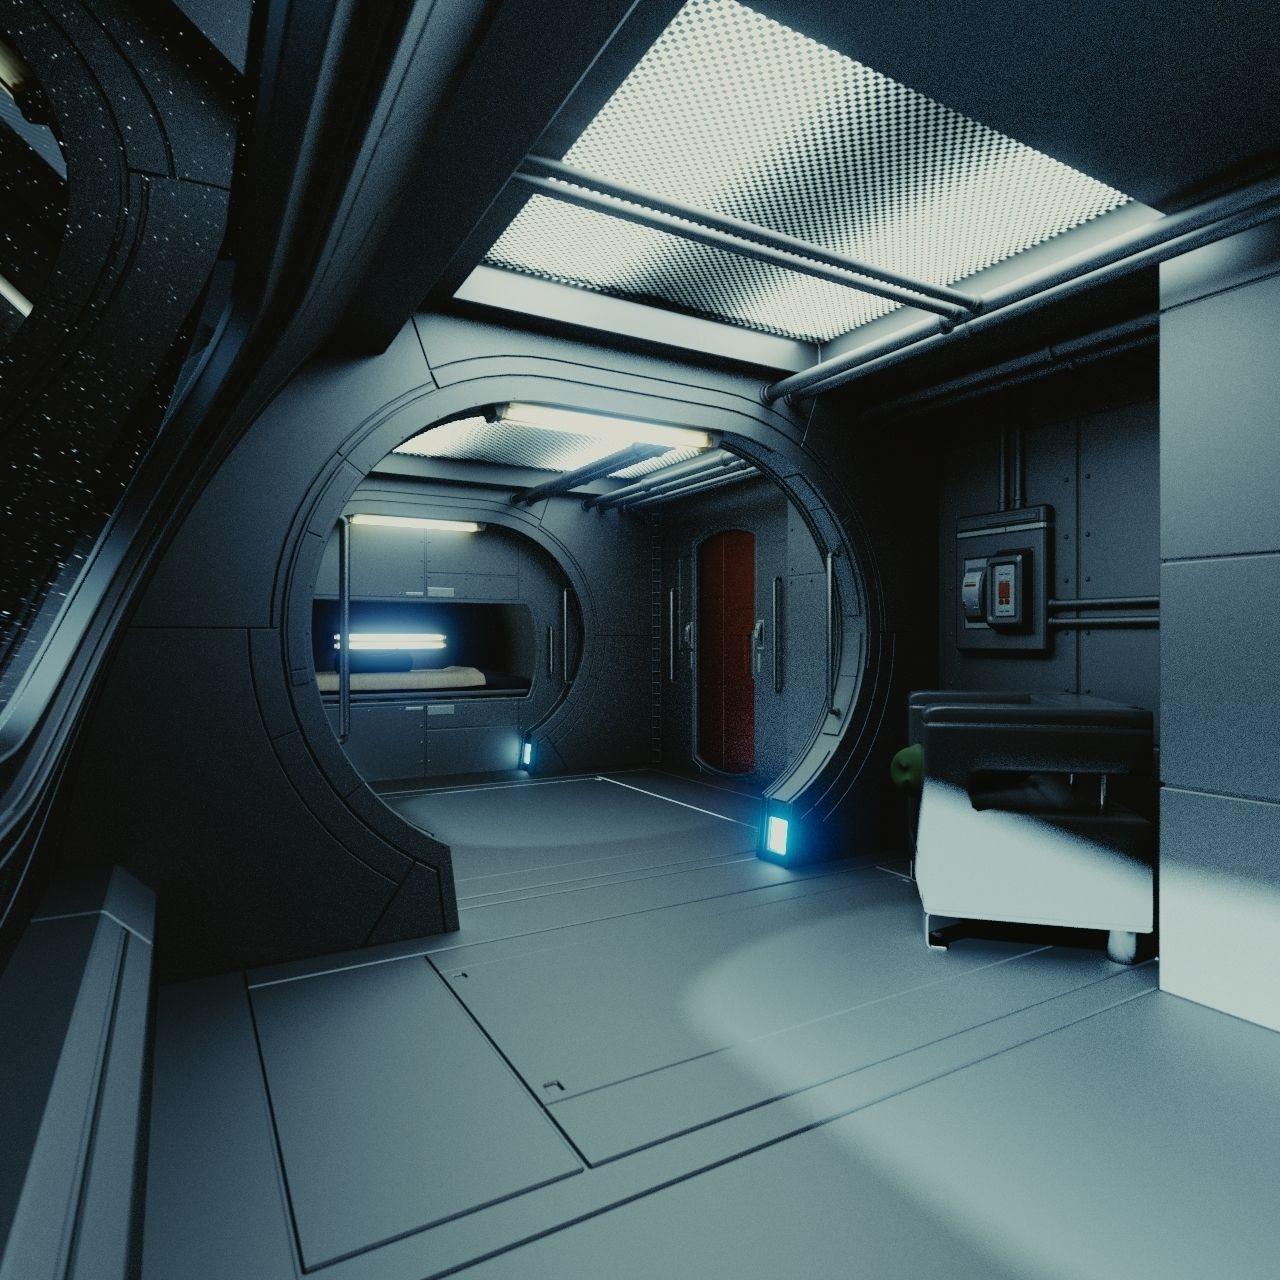 Spaceship interior c hd 3d model obj fbx blend - Interior space ...